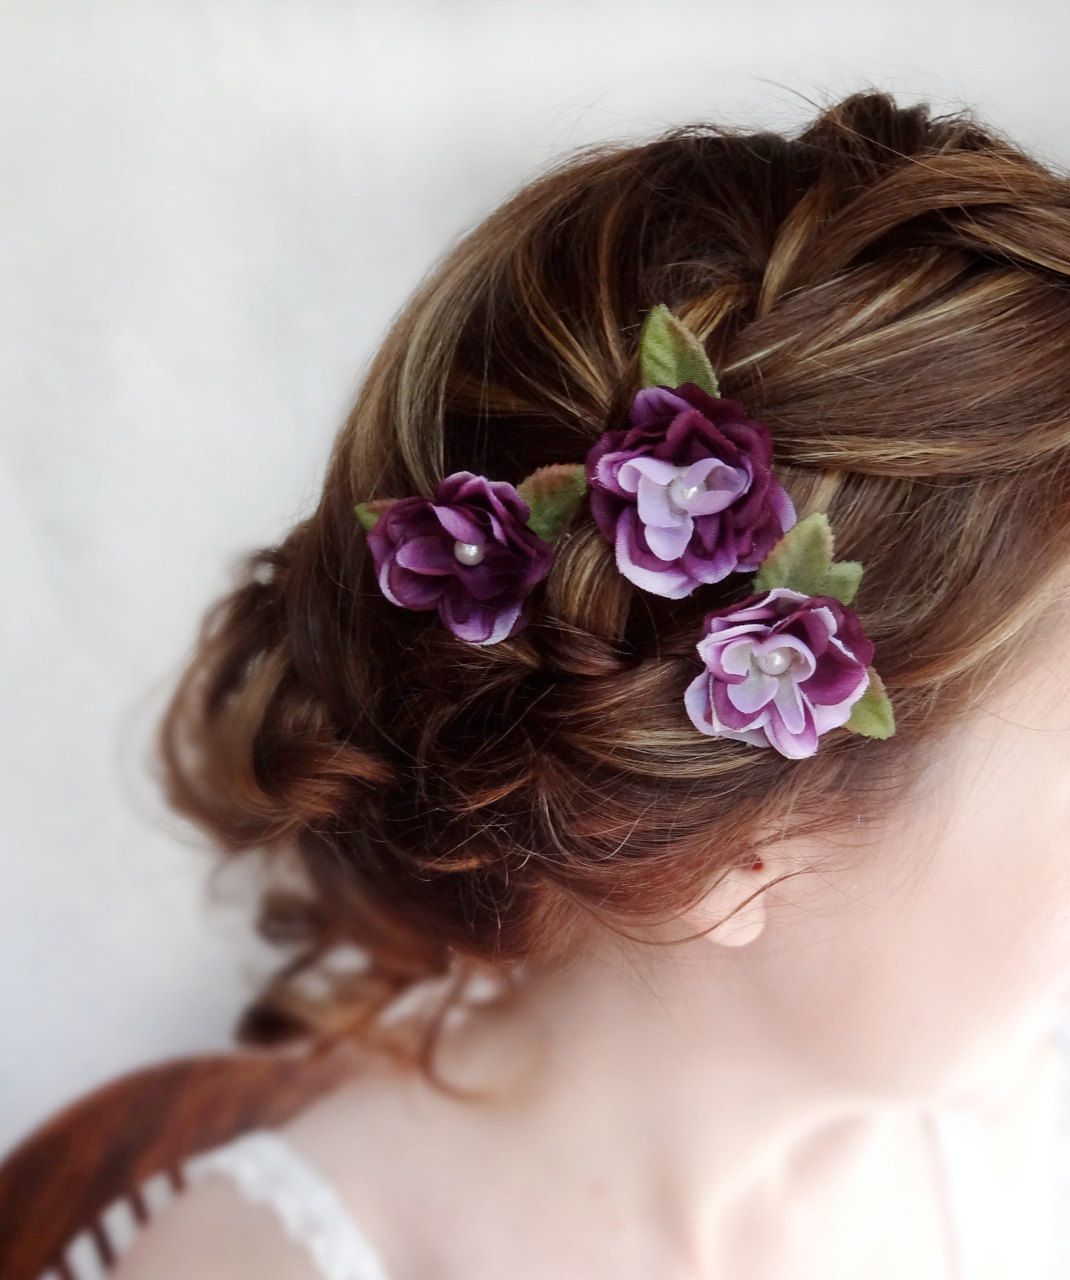 eggplant flower hair accessory, purple flower hair pins, bridal